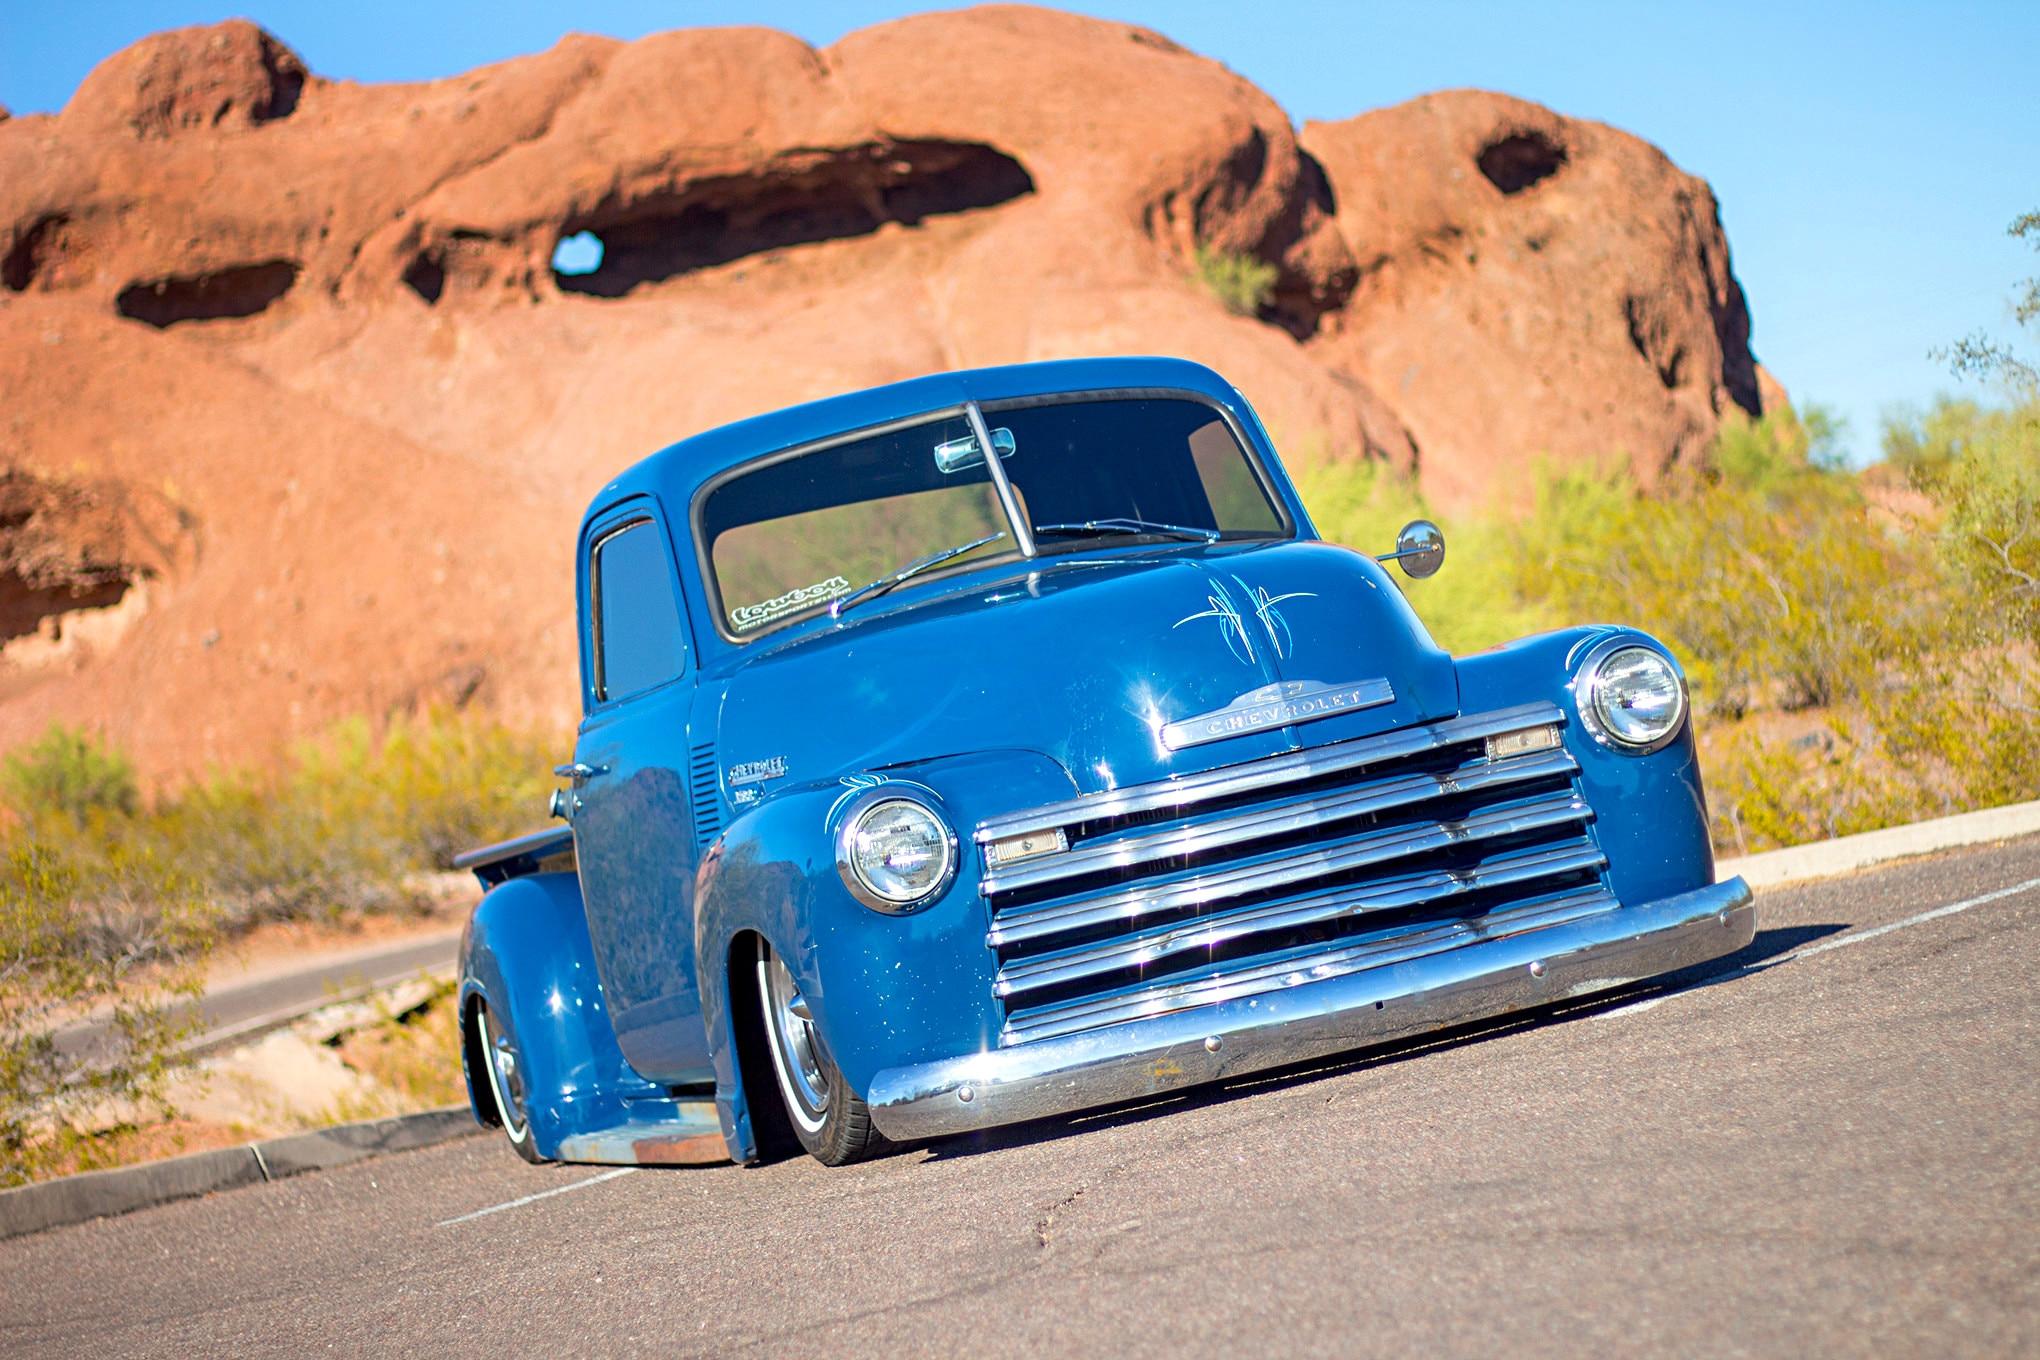 Chad Fincher's Slammed 1950 Chevy 3100 Truck